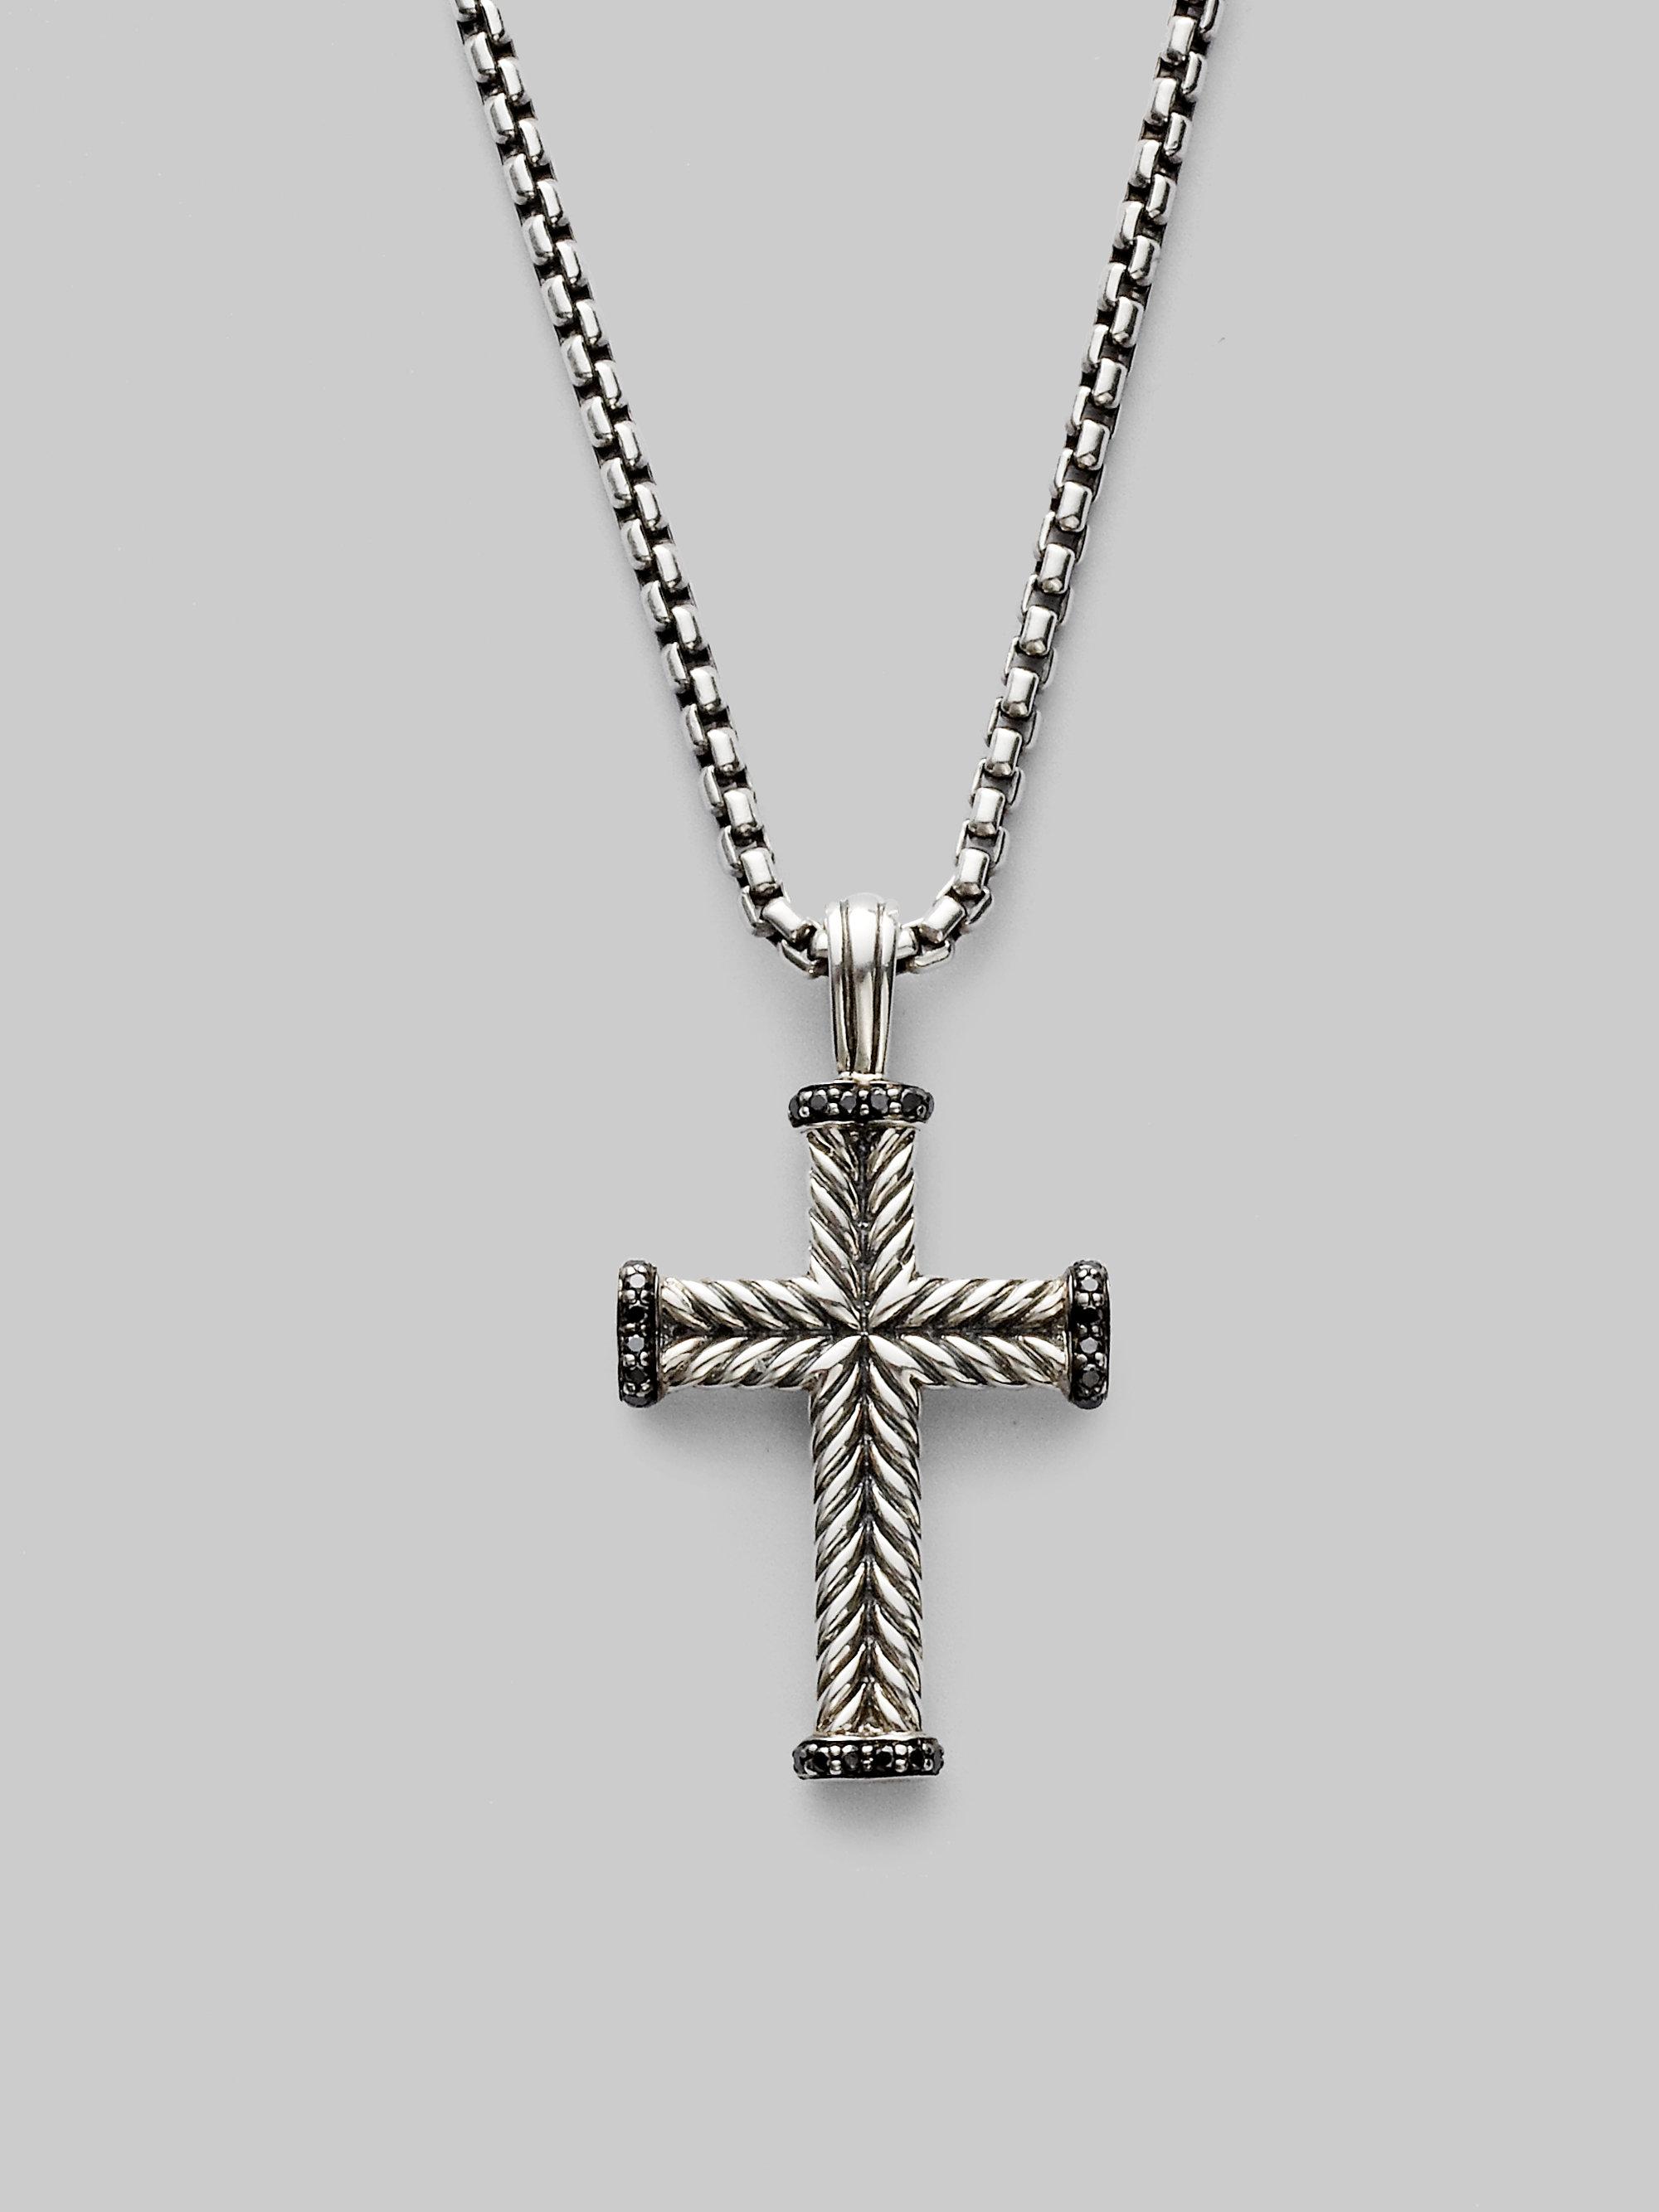 David Yurman Black Diamond Cross Necklace In Silver For